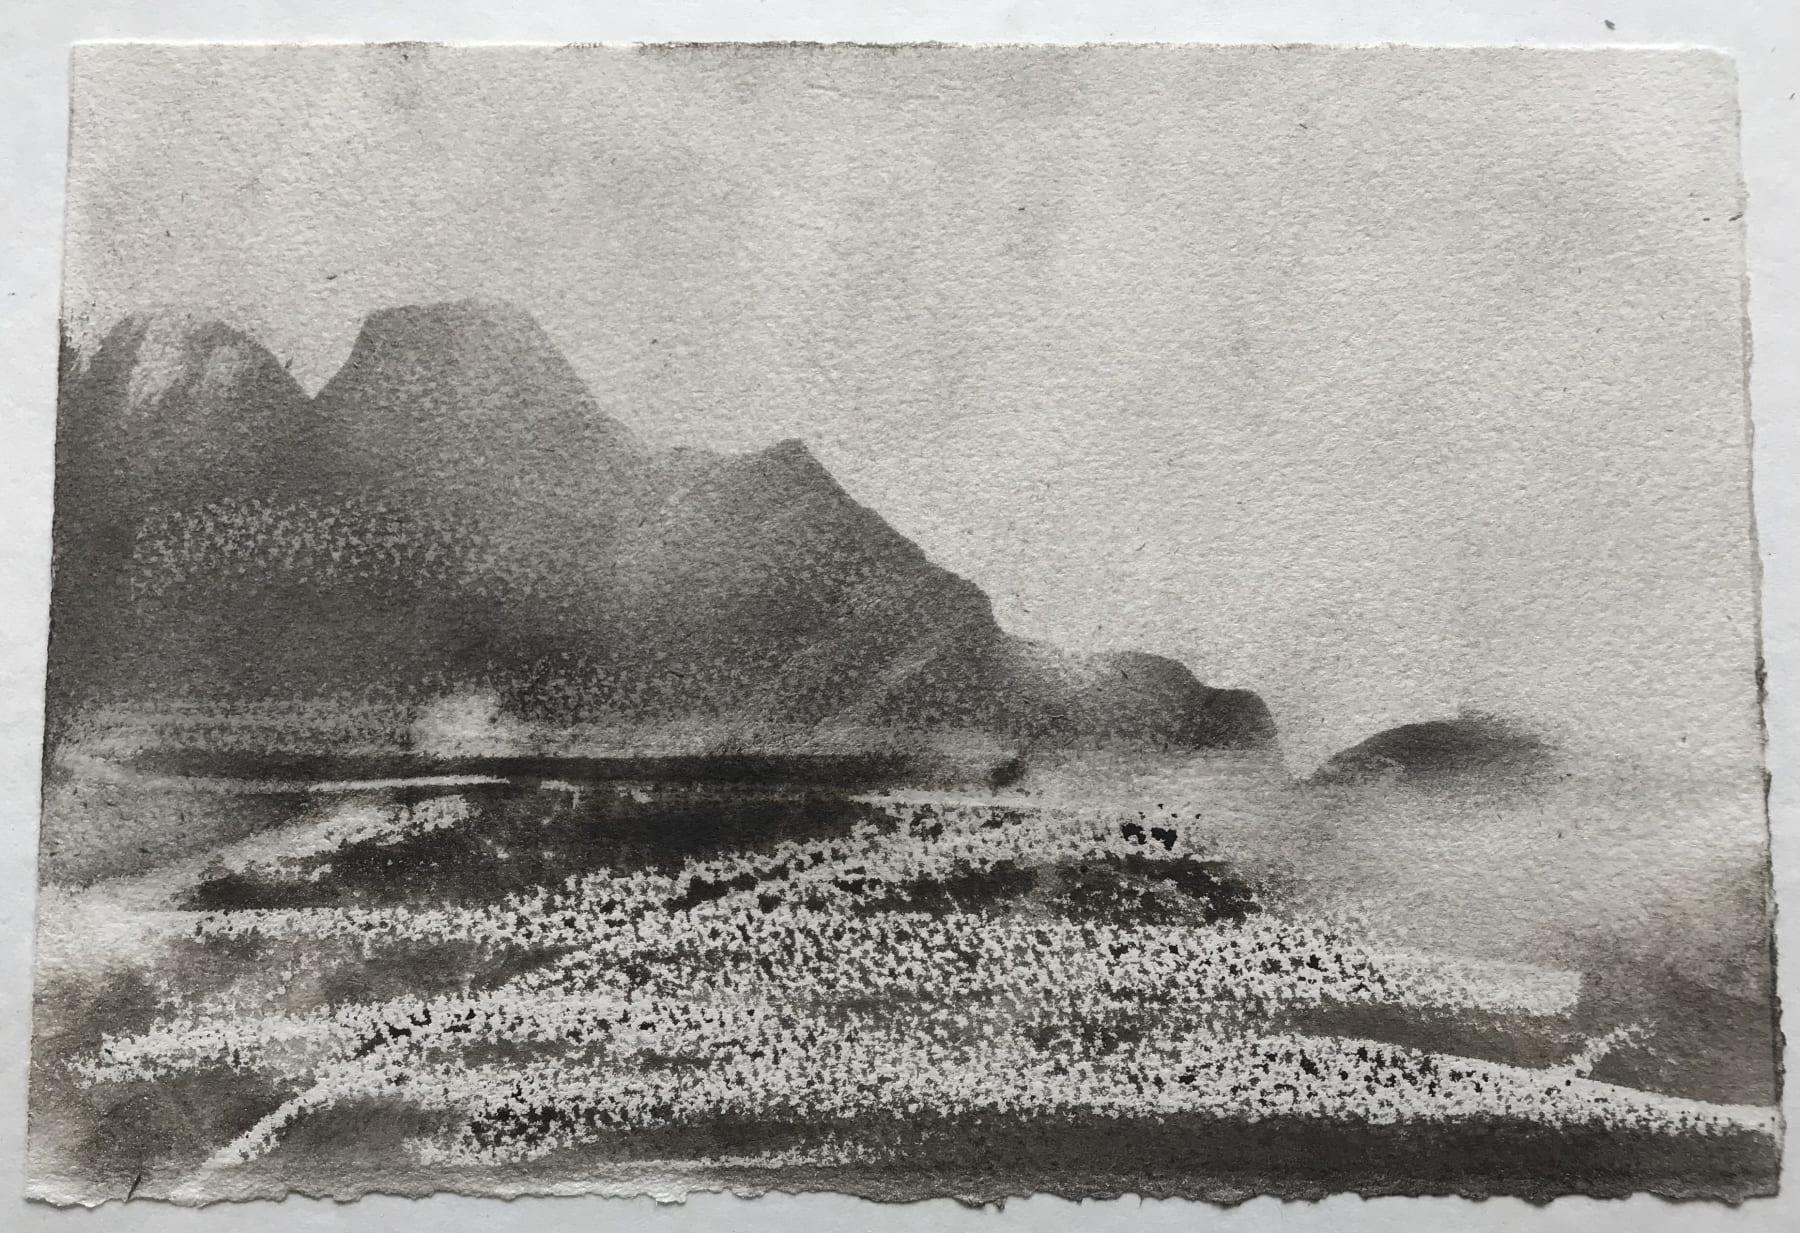 Jason Hicklin, North Gut, Grassholm Island, 2020